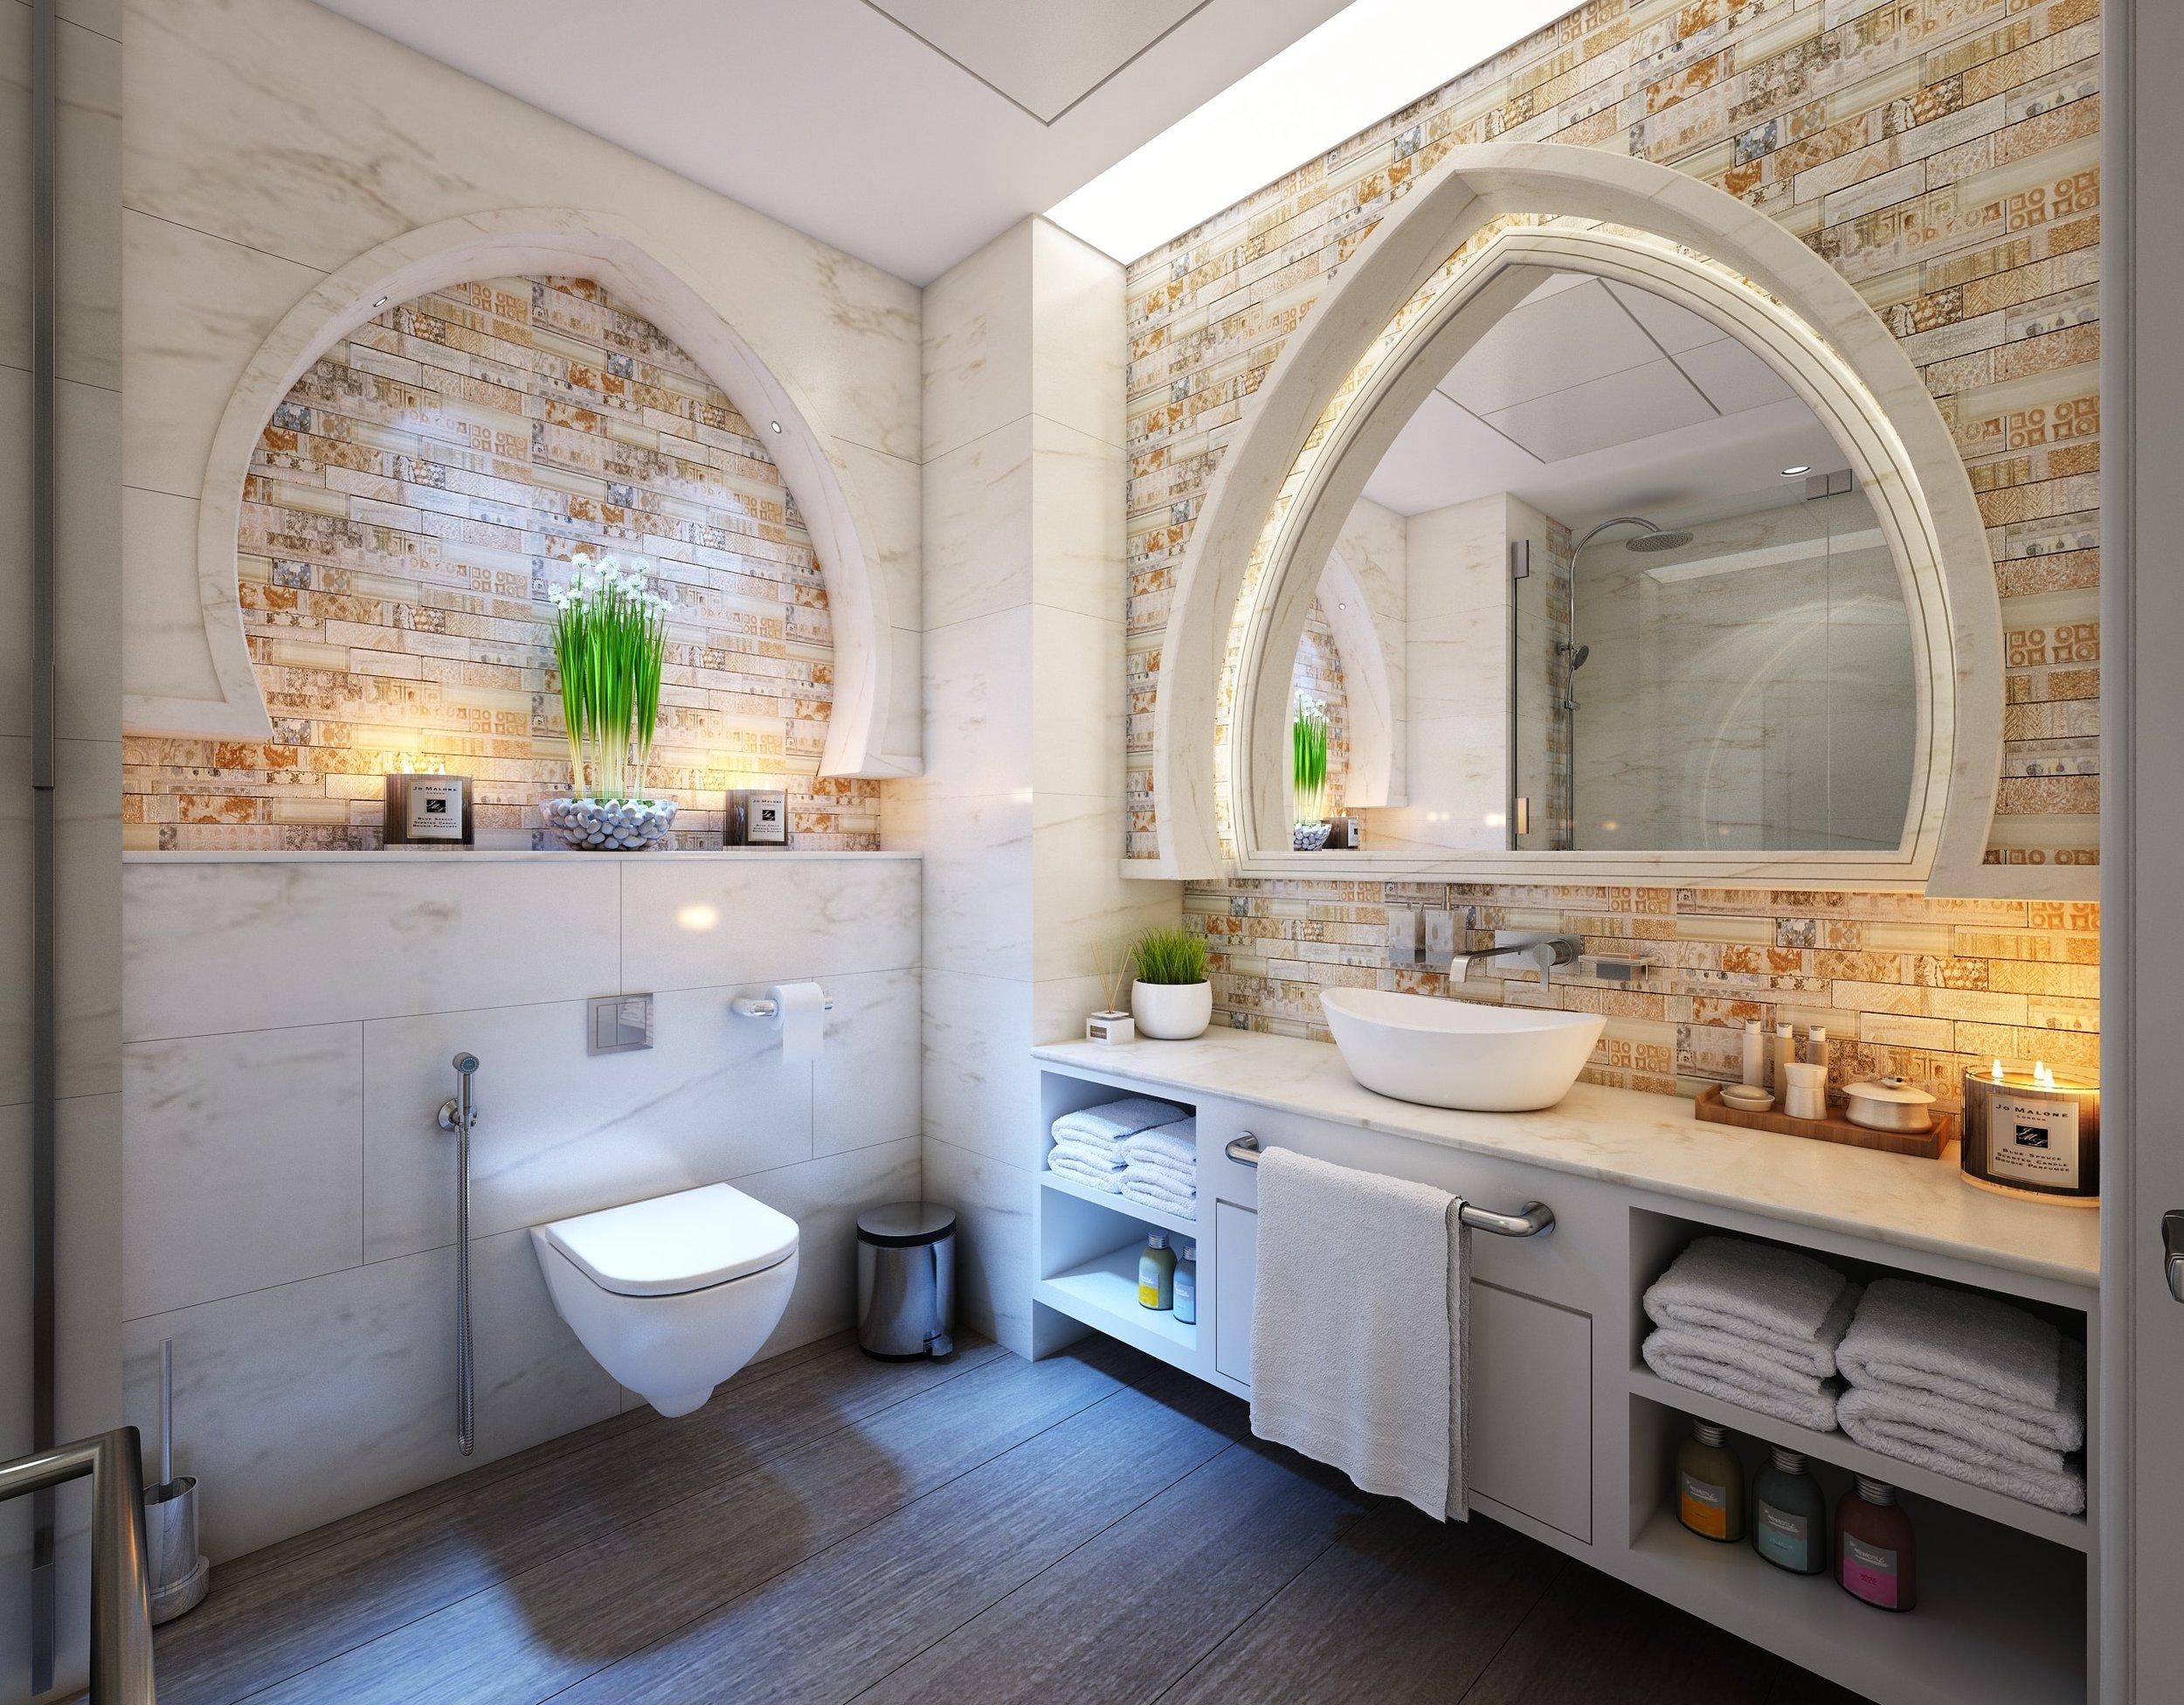 bathroom-cabinet-candles-342800.jpg